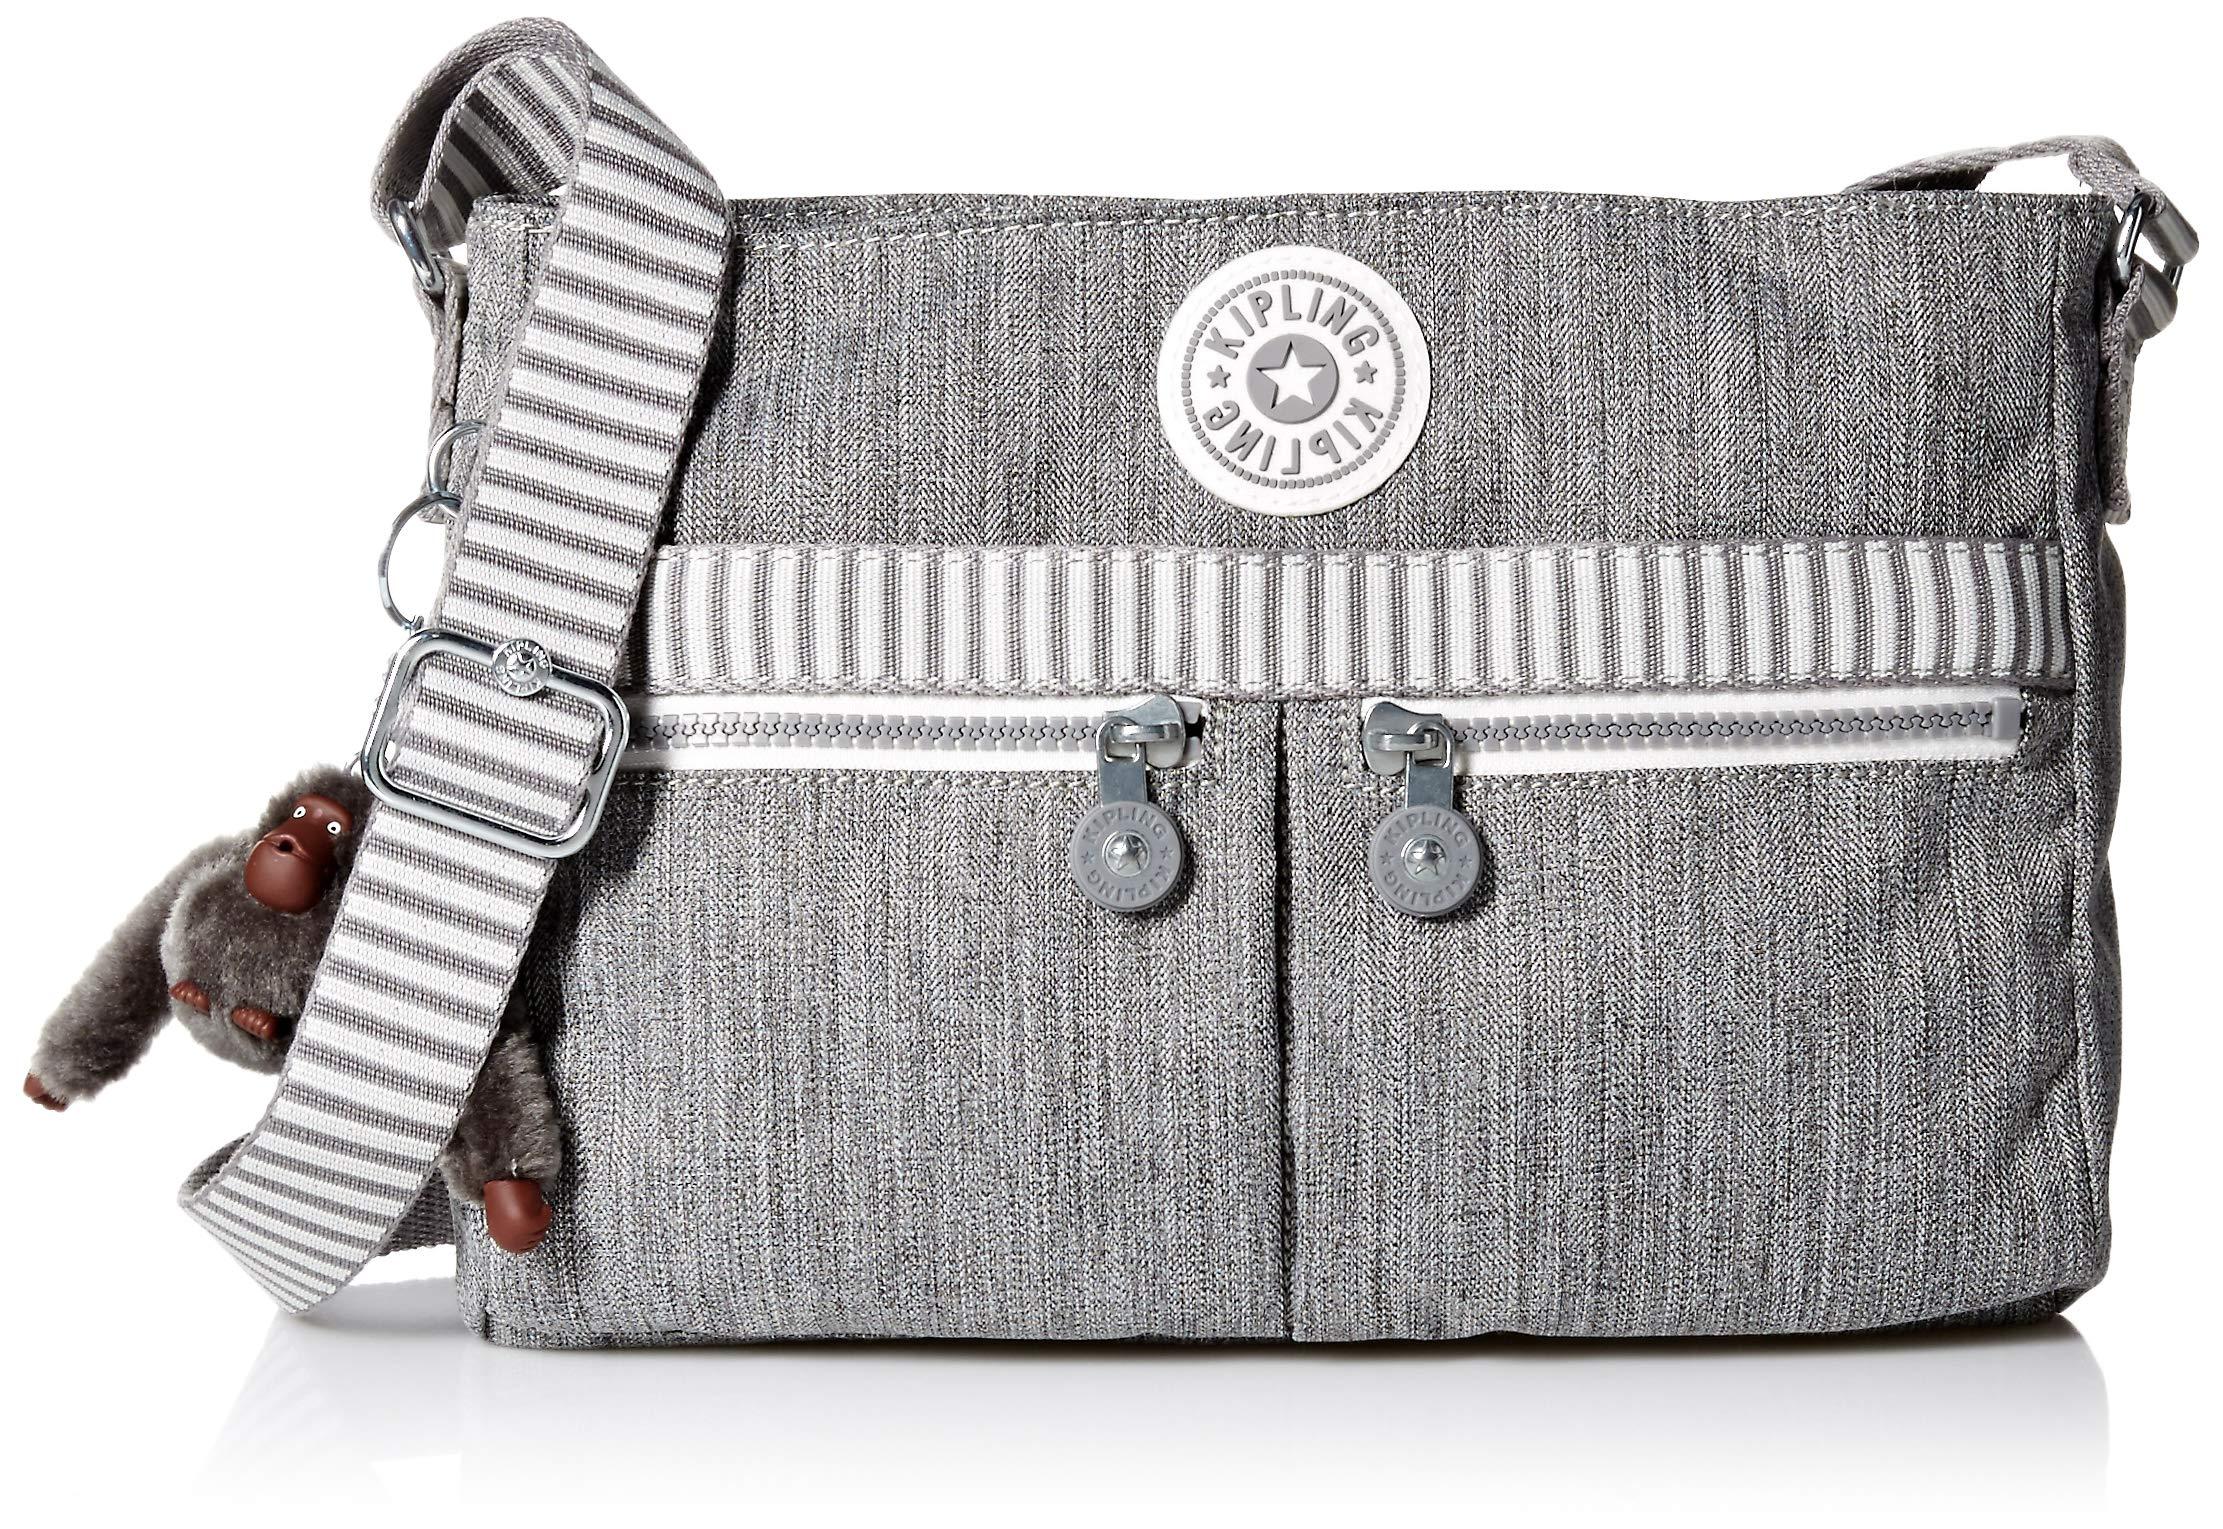 Kipling Women's Angie Crossbody Bag, Adjustable Shoulder Strap, Zip Closure, grey weave